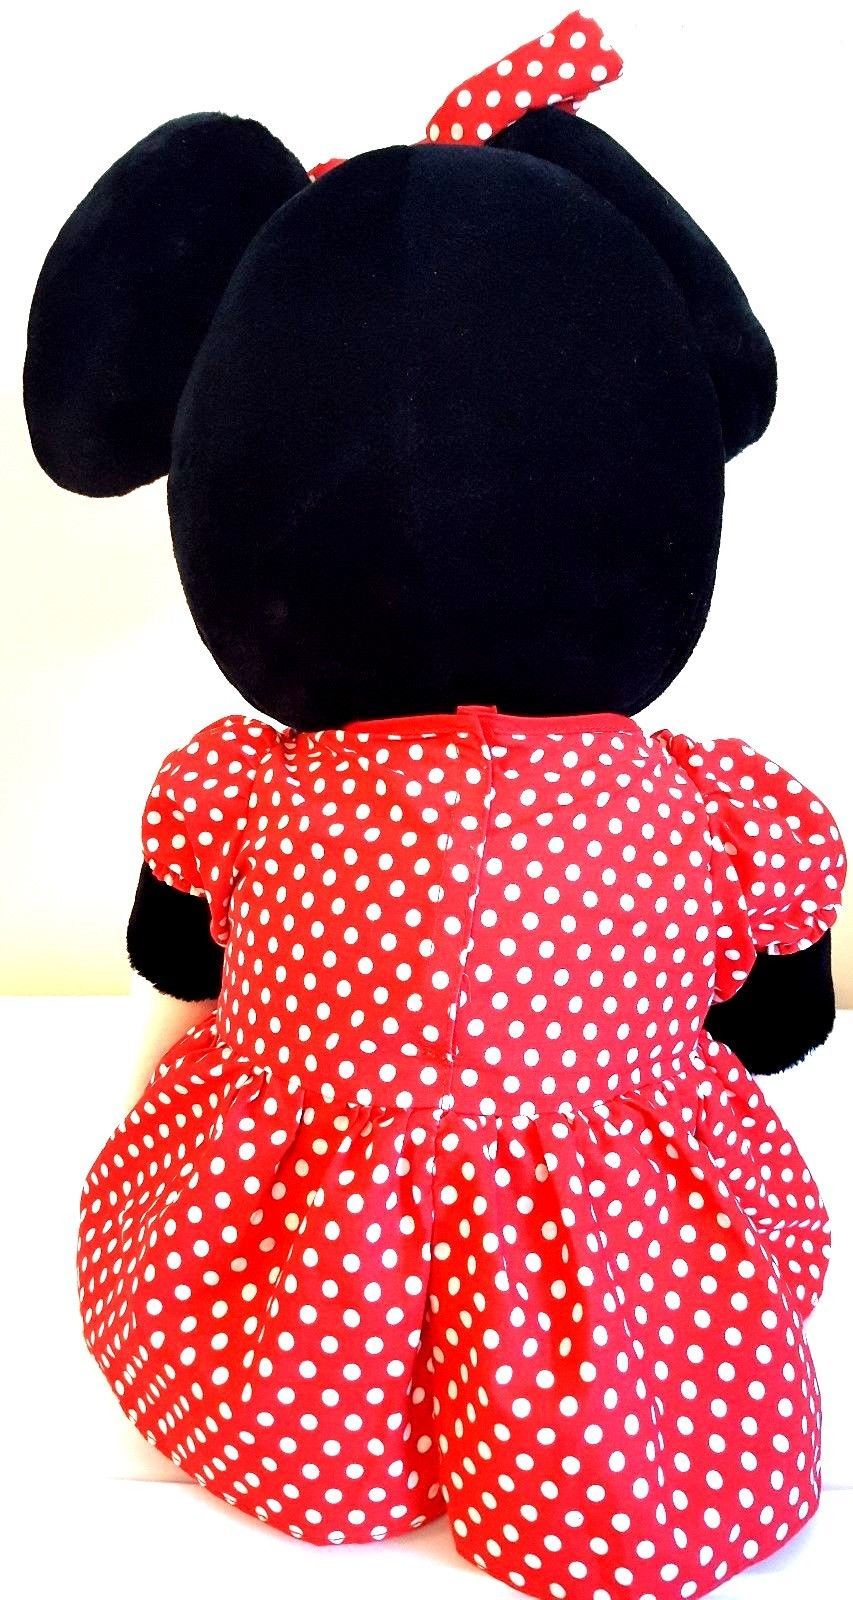 DISNEYLAND WALT DISNEY WORLD – BIG Minnie Mouse Plush Stuffed Animal – 20 inches